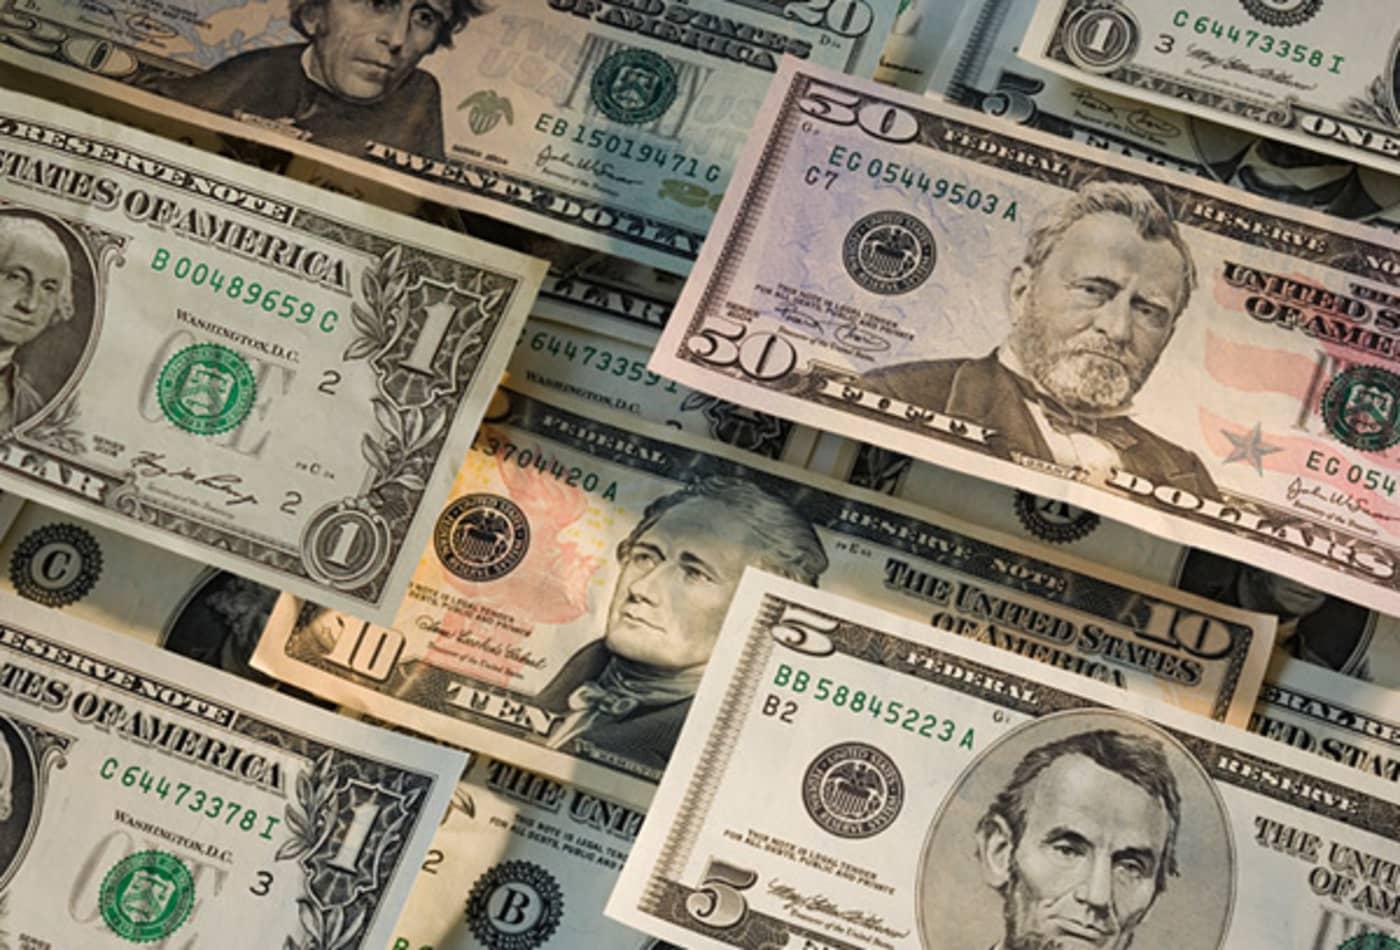 how-big-is-apple-bills-in-circulation.jpg